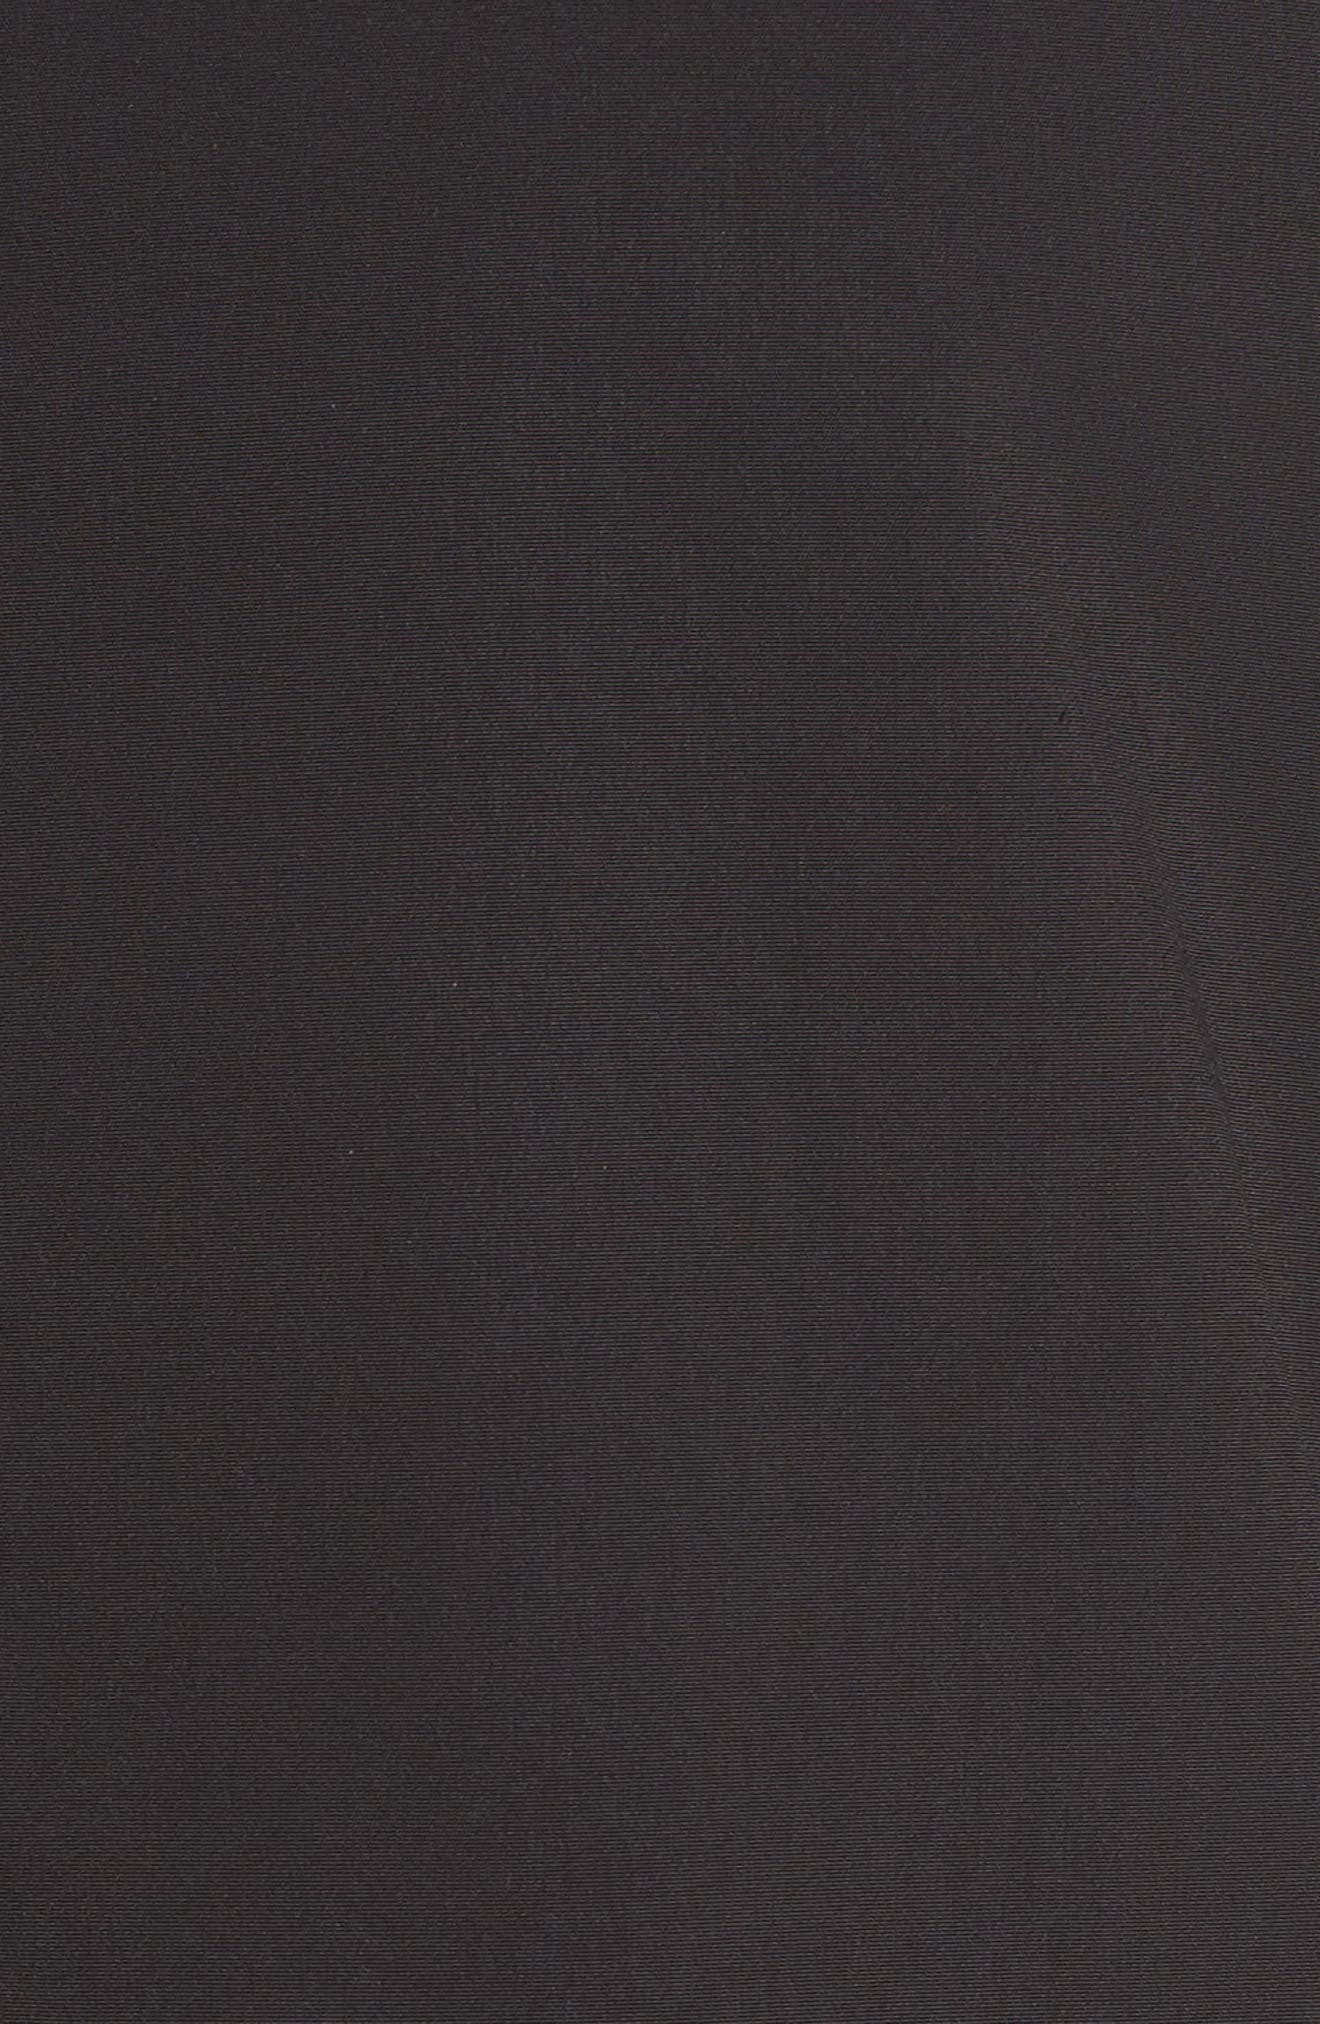 Long Bomber Jacket,                             Alternate thumbnail 6, color,                             Black